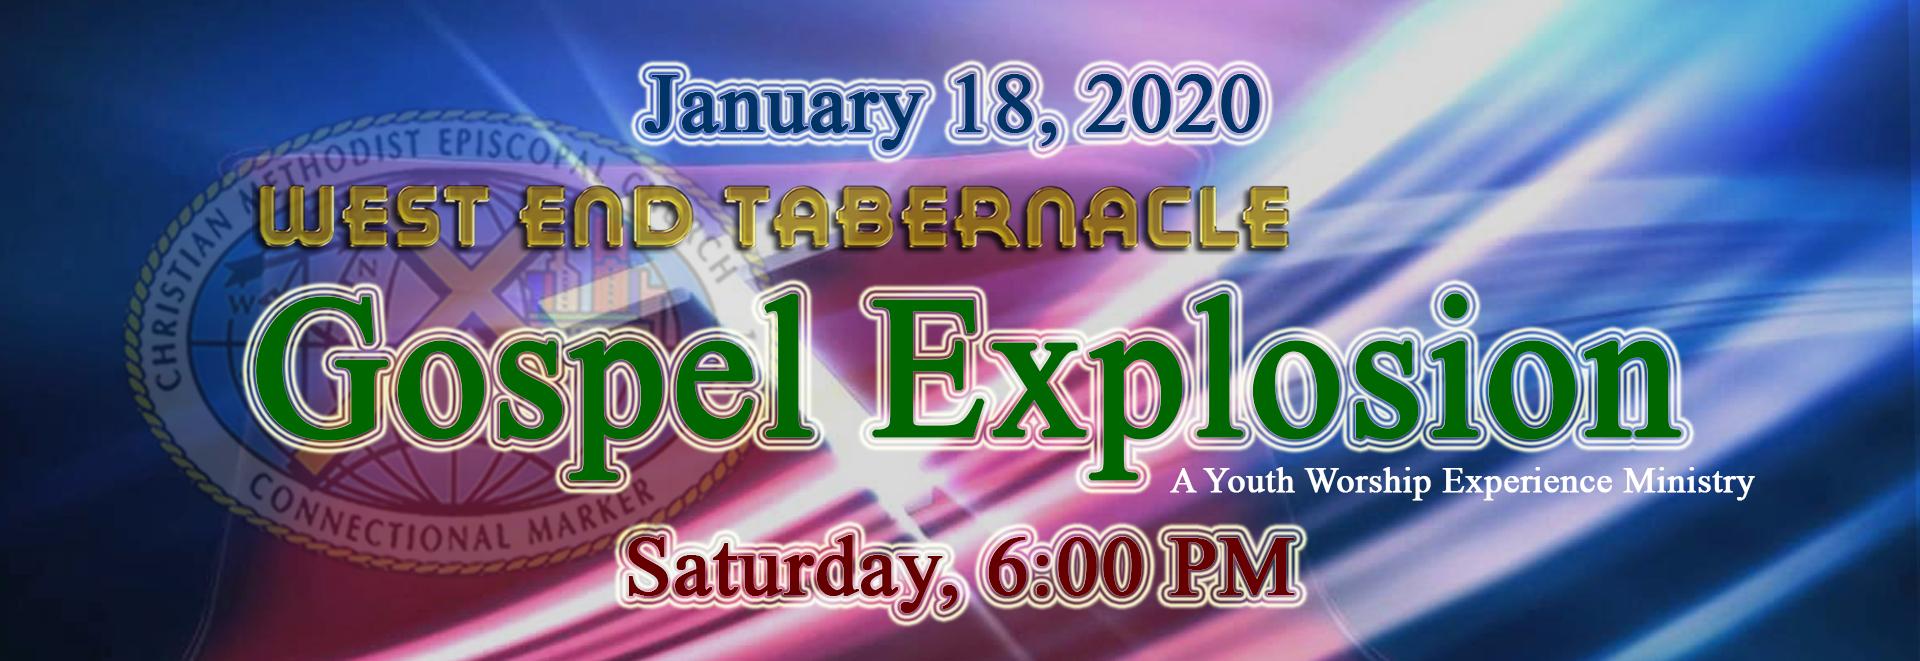 Gospel Worship Explosion.png